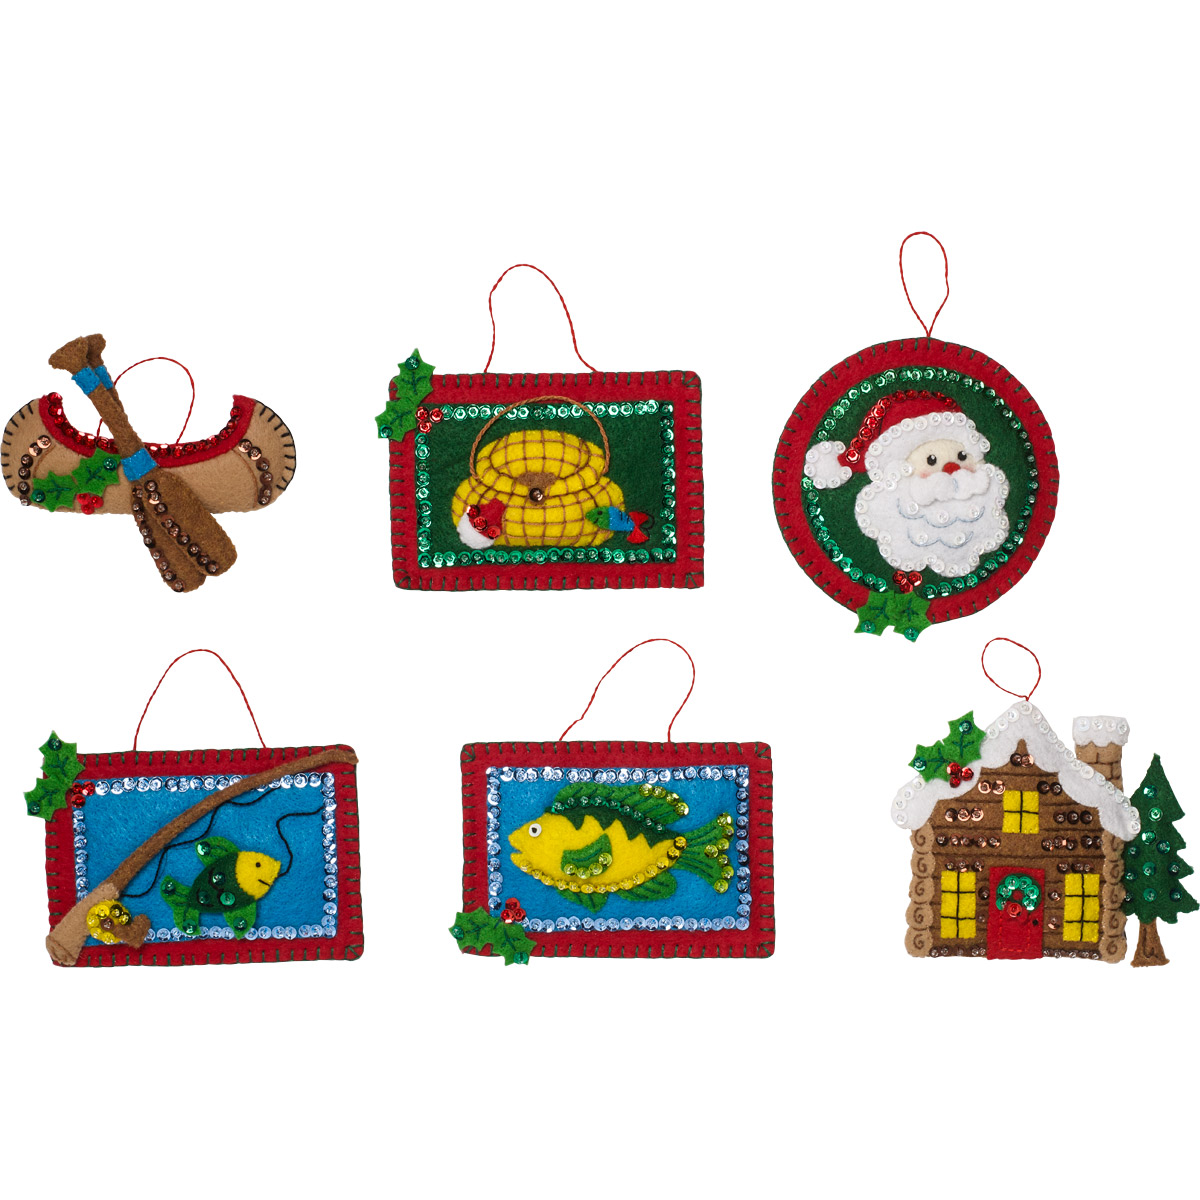 Bucilla ® Seasonal - Felt - Ornament Kits - Lodge Santa